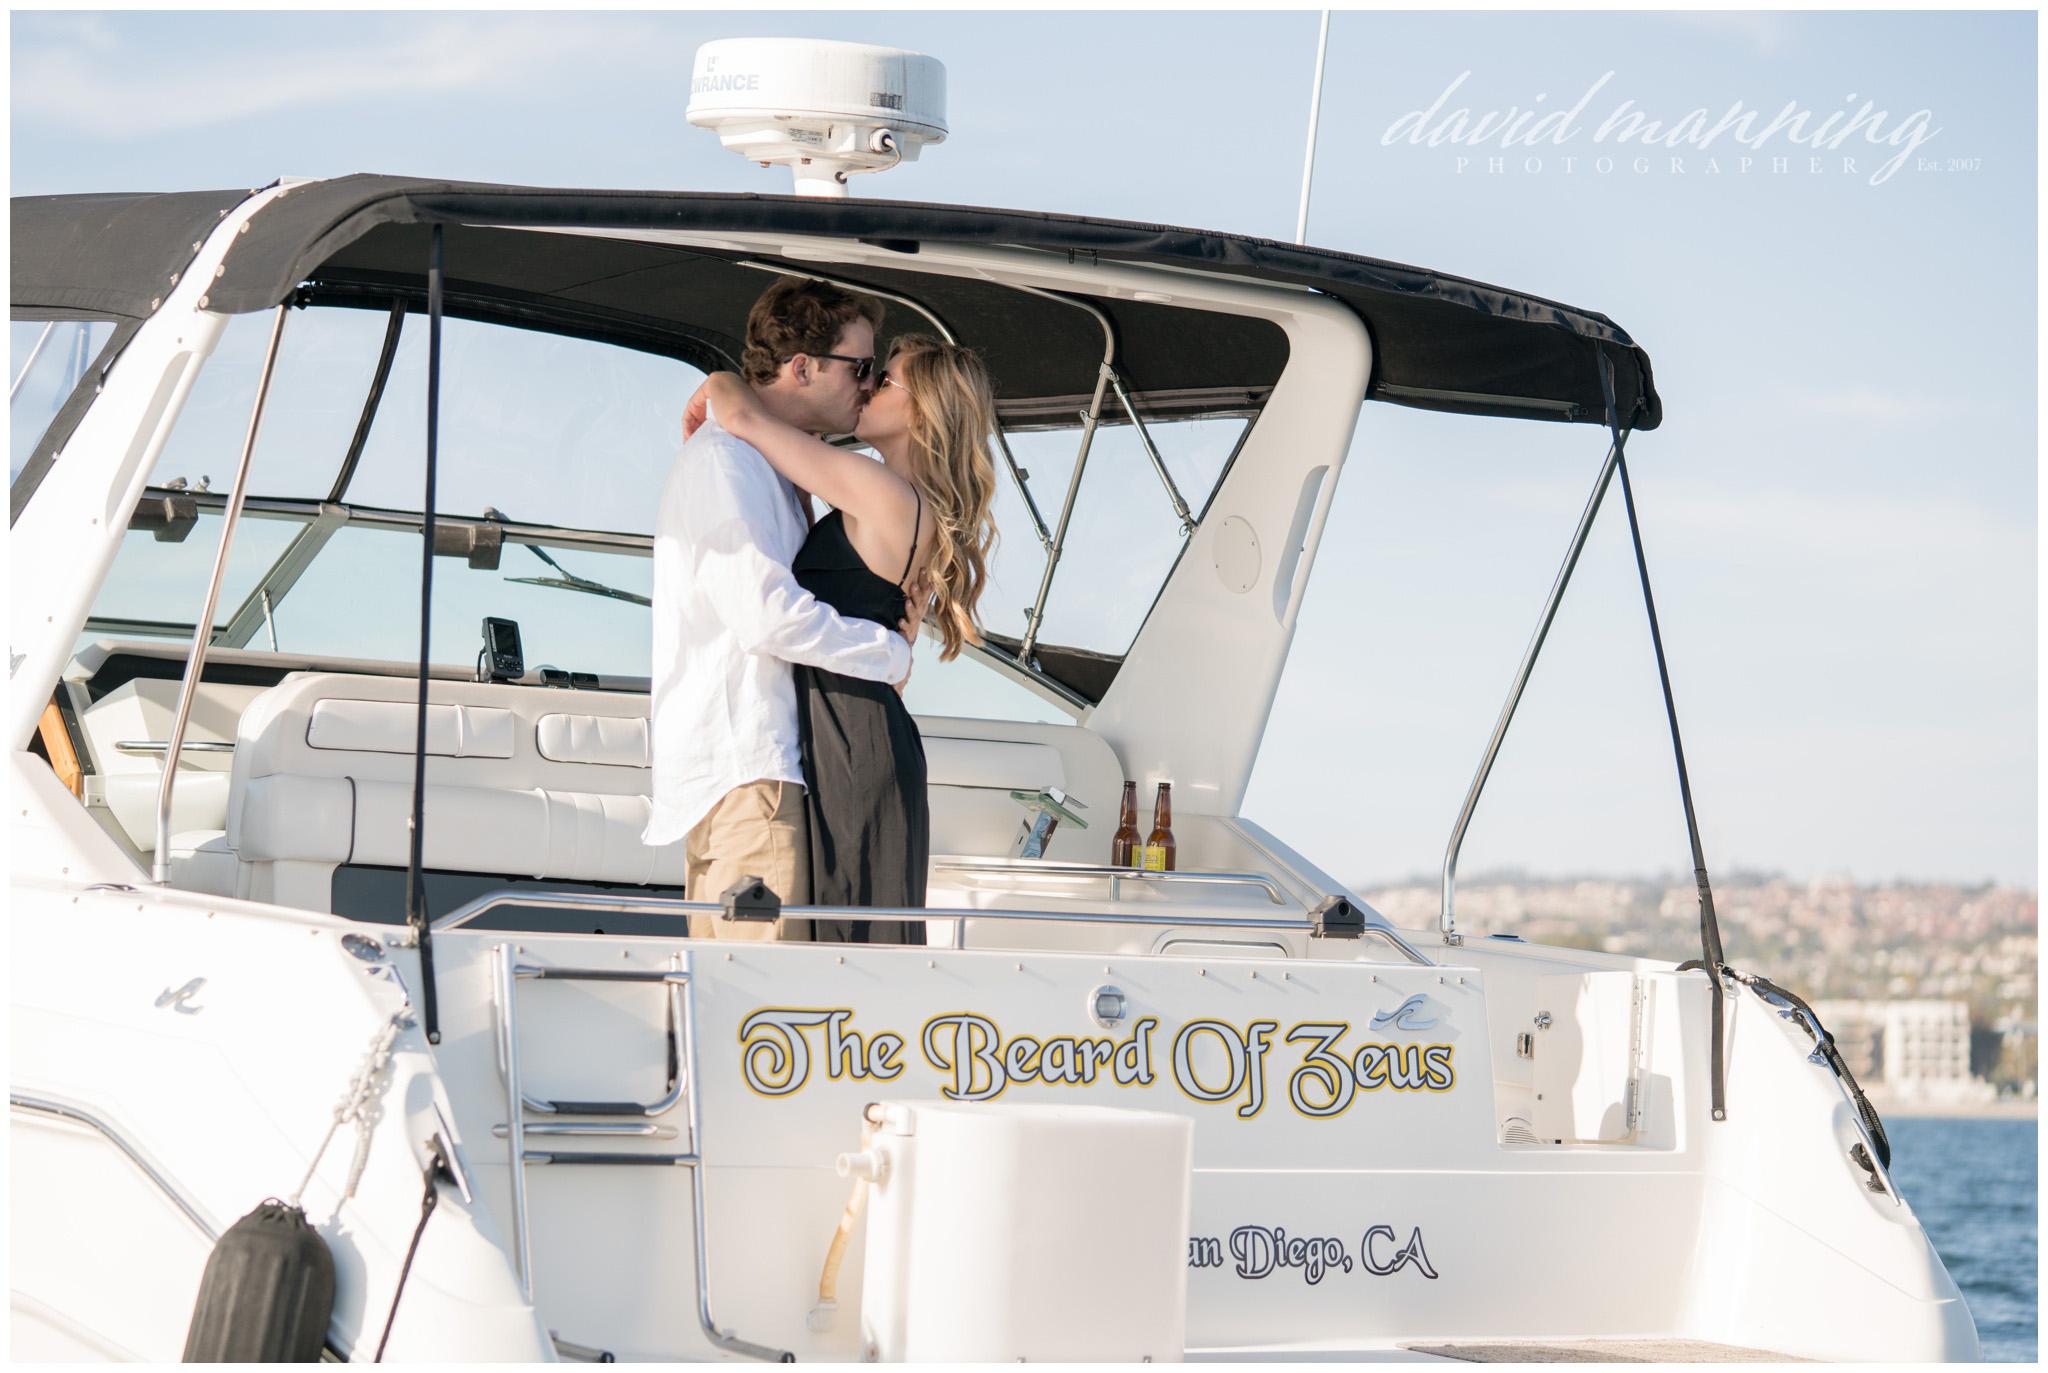 Alyssa-Taylor-Engagement-David-Manning-Photographer-0074.JPG